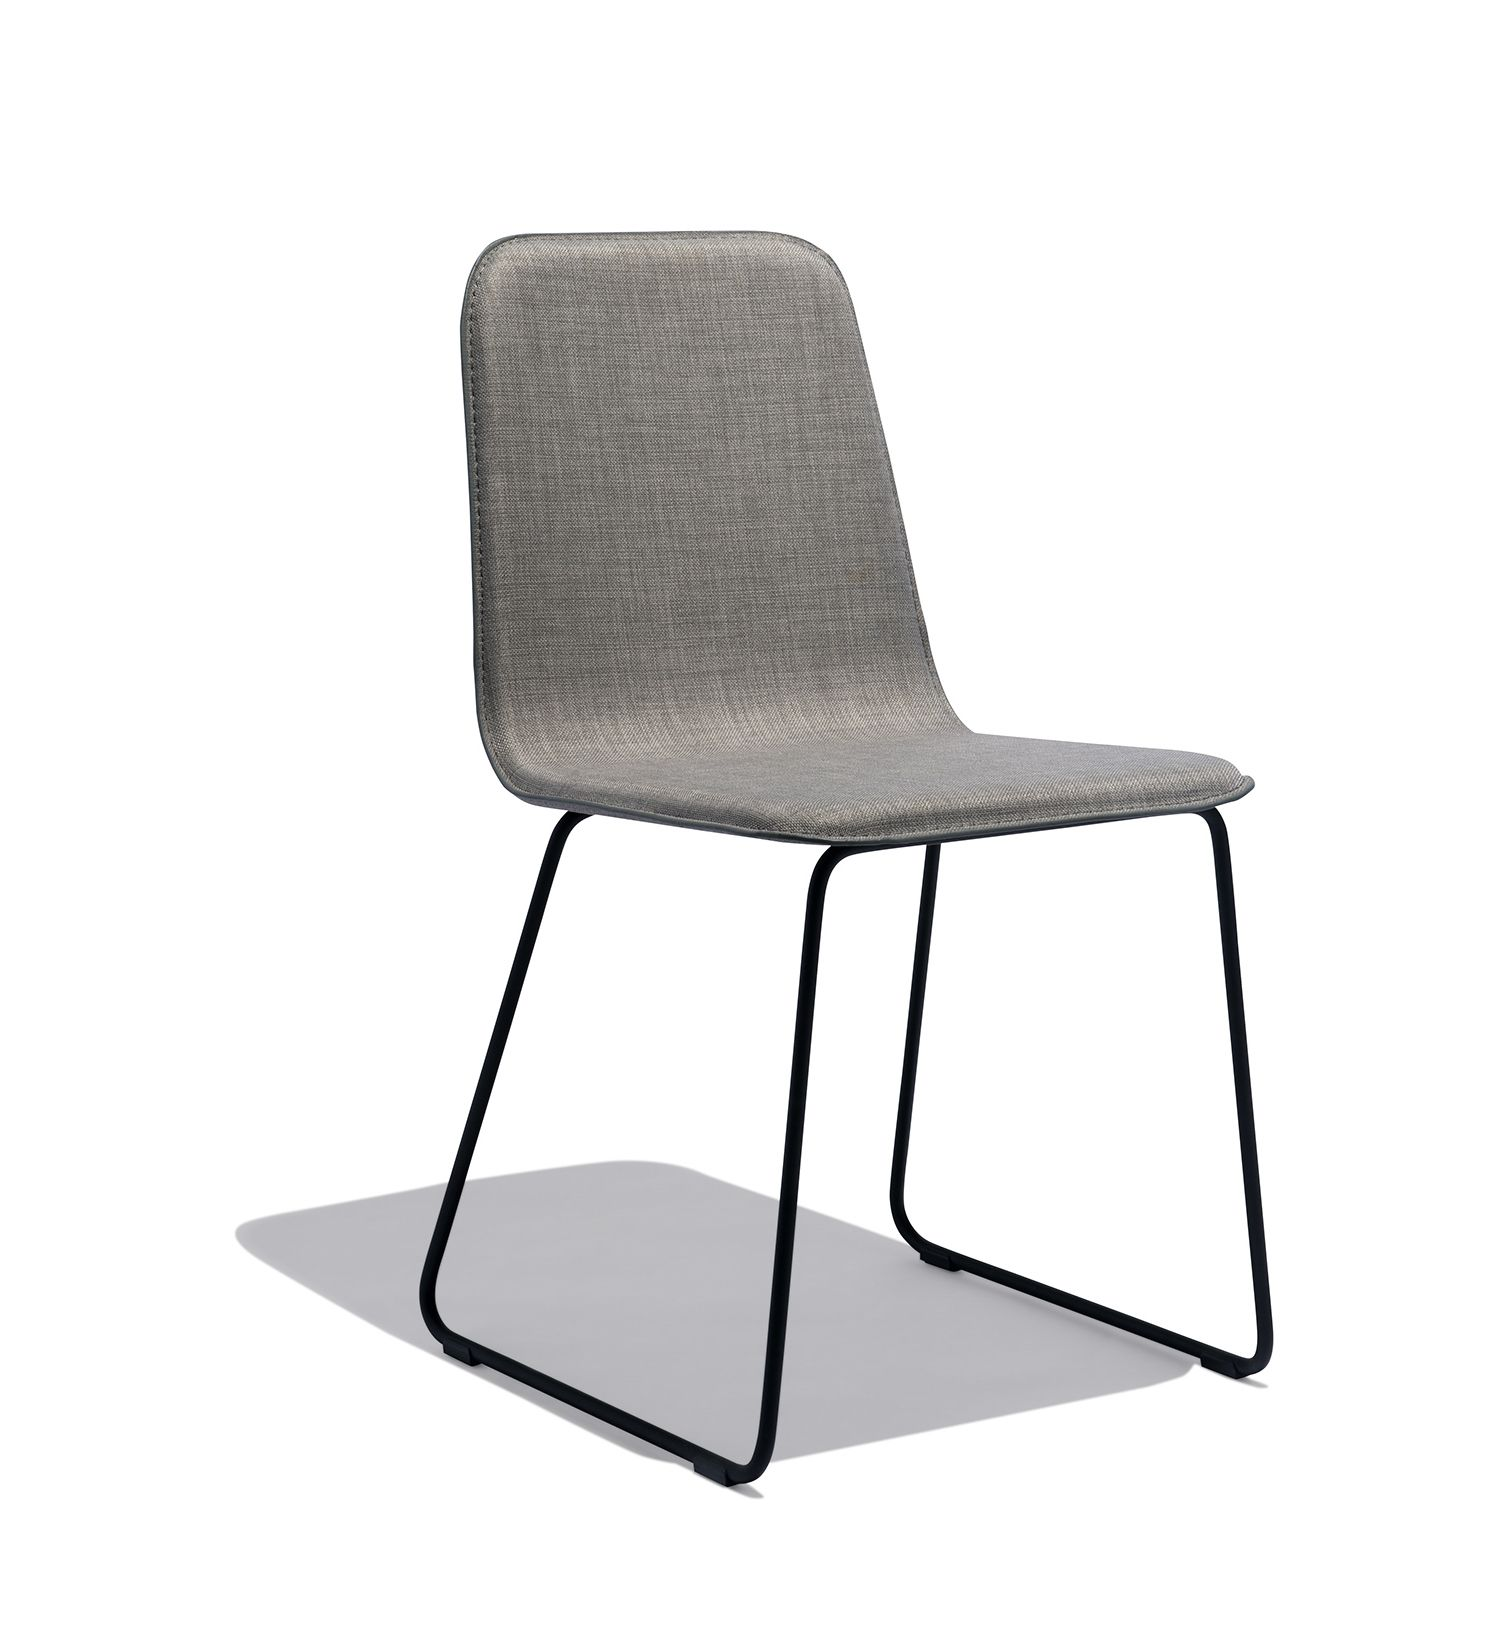 Lolli Chair Chair Chair Design Dinning Chairs